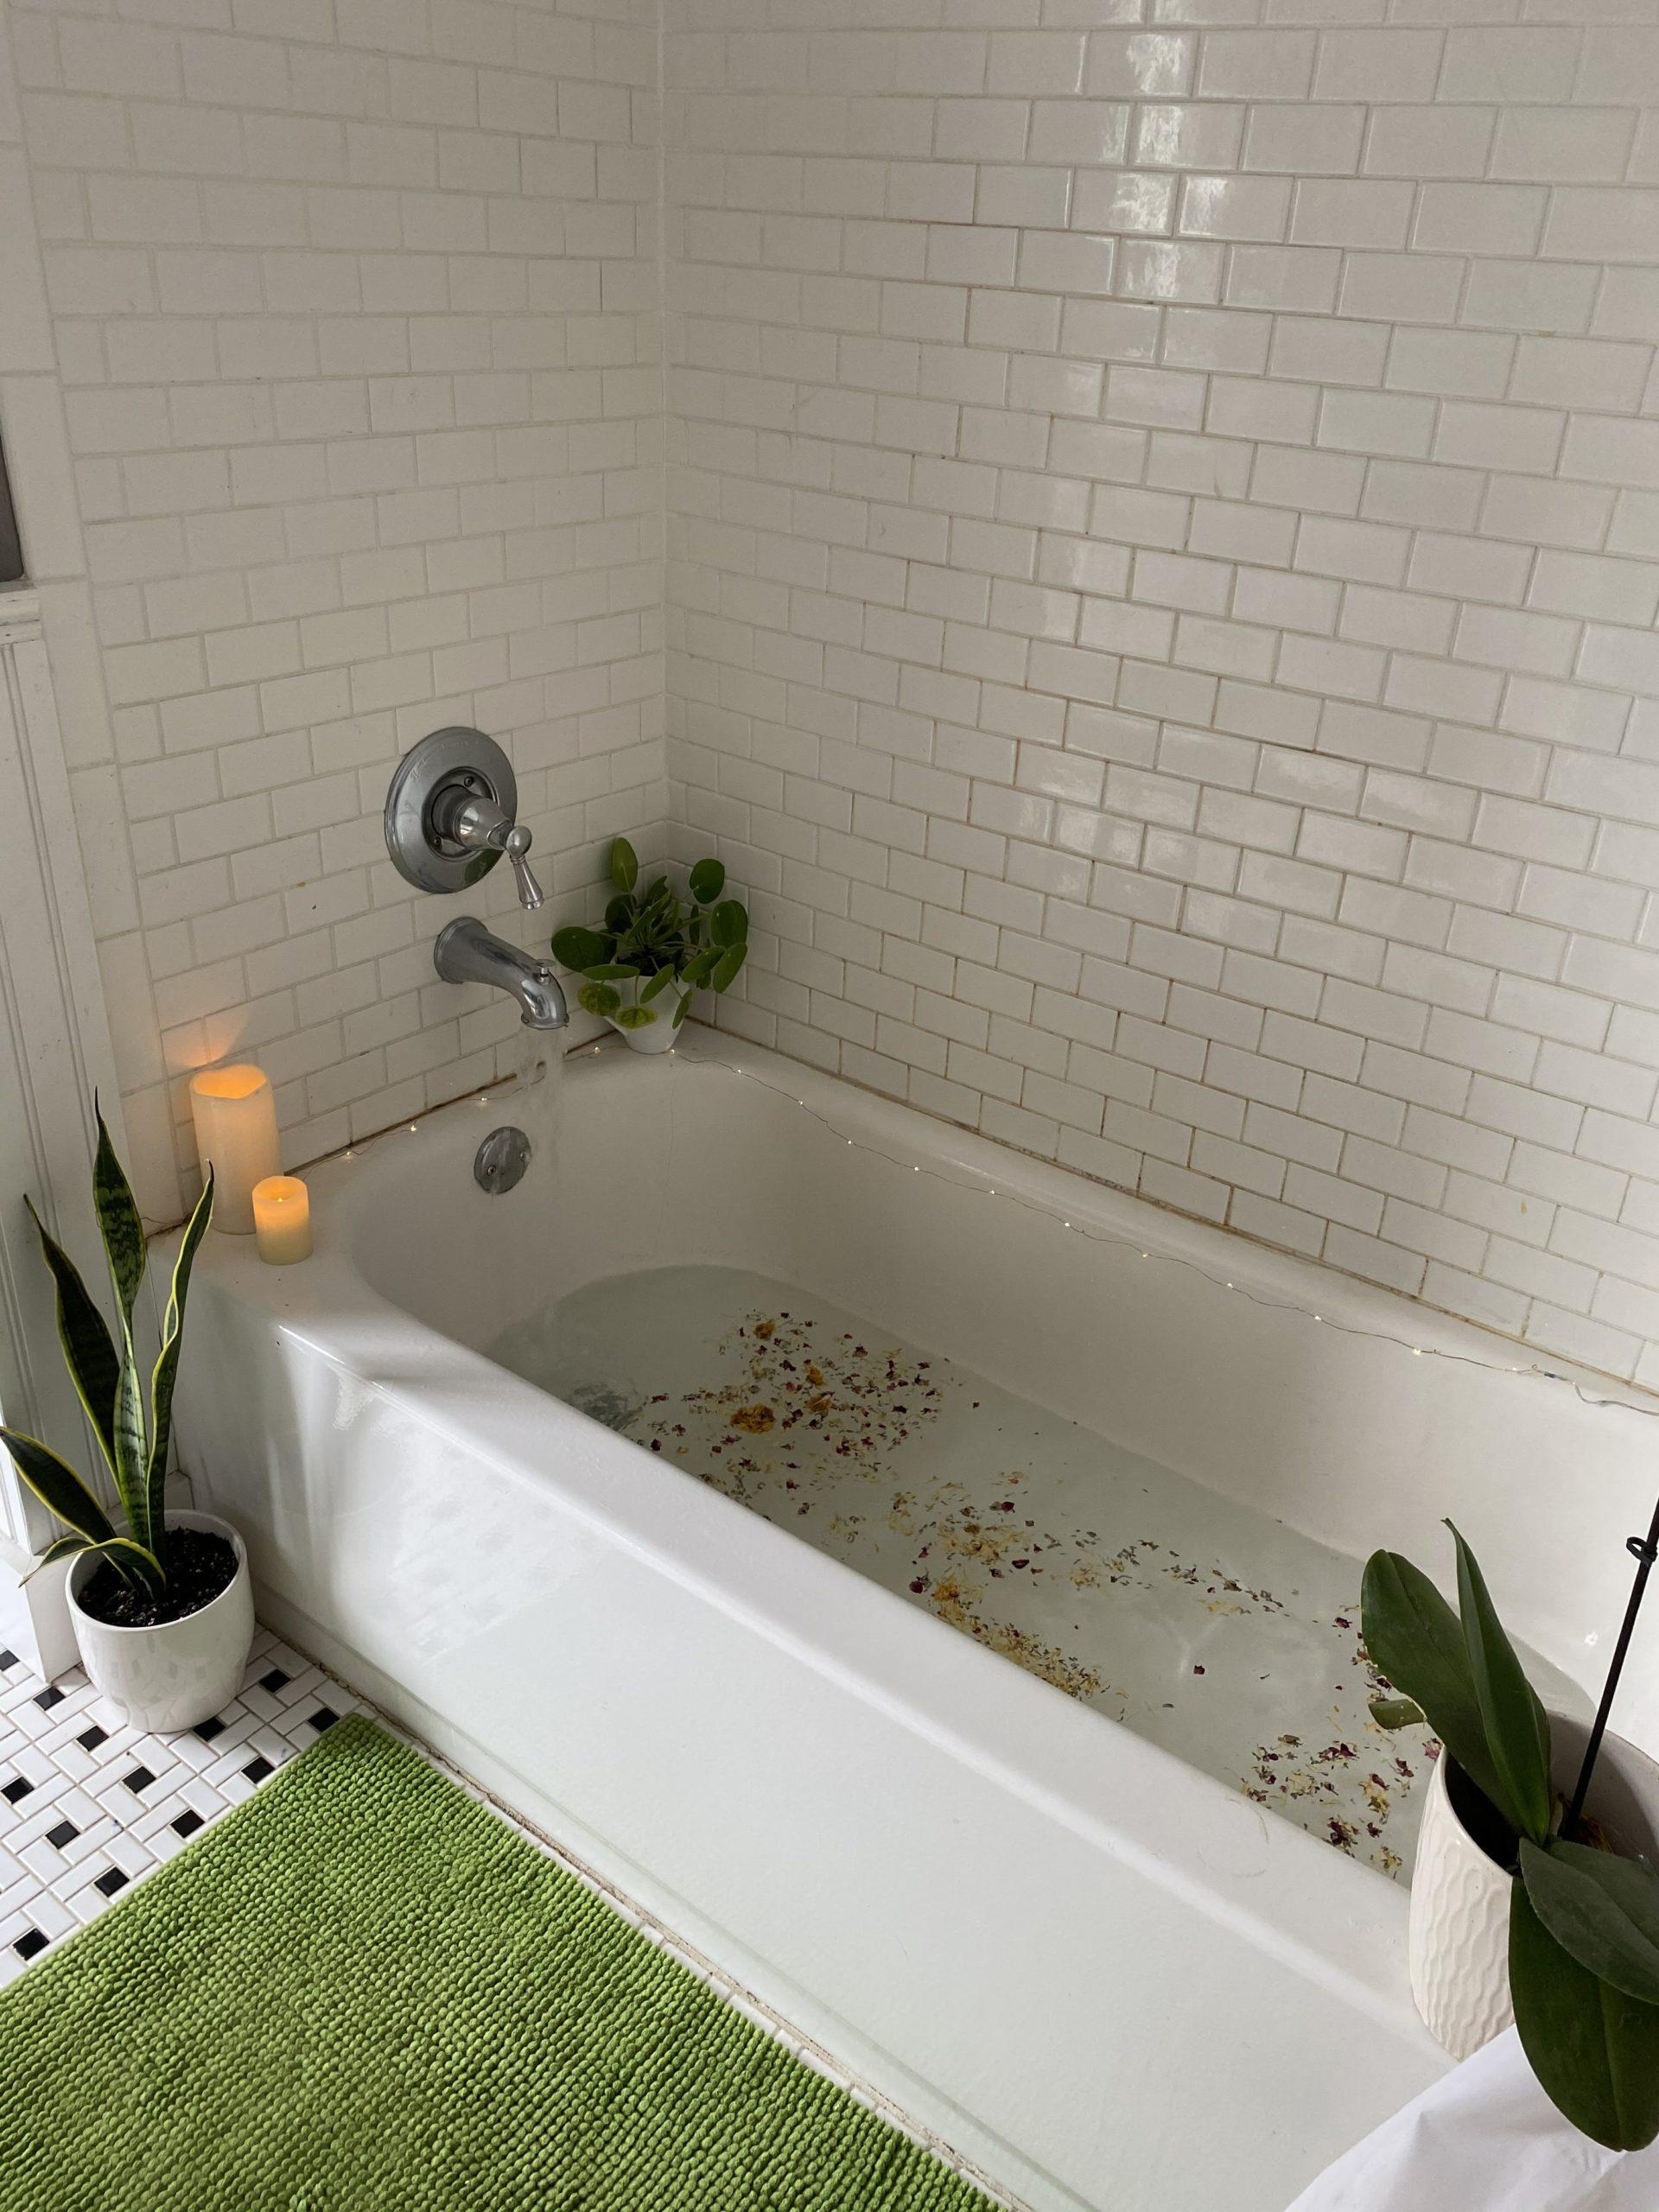 A tub ready for a home birth.